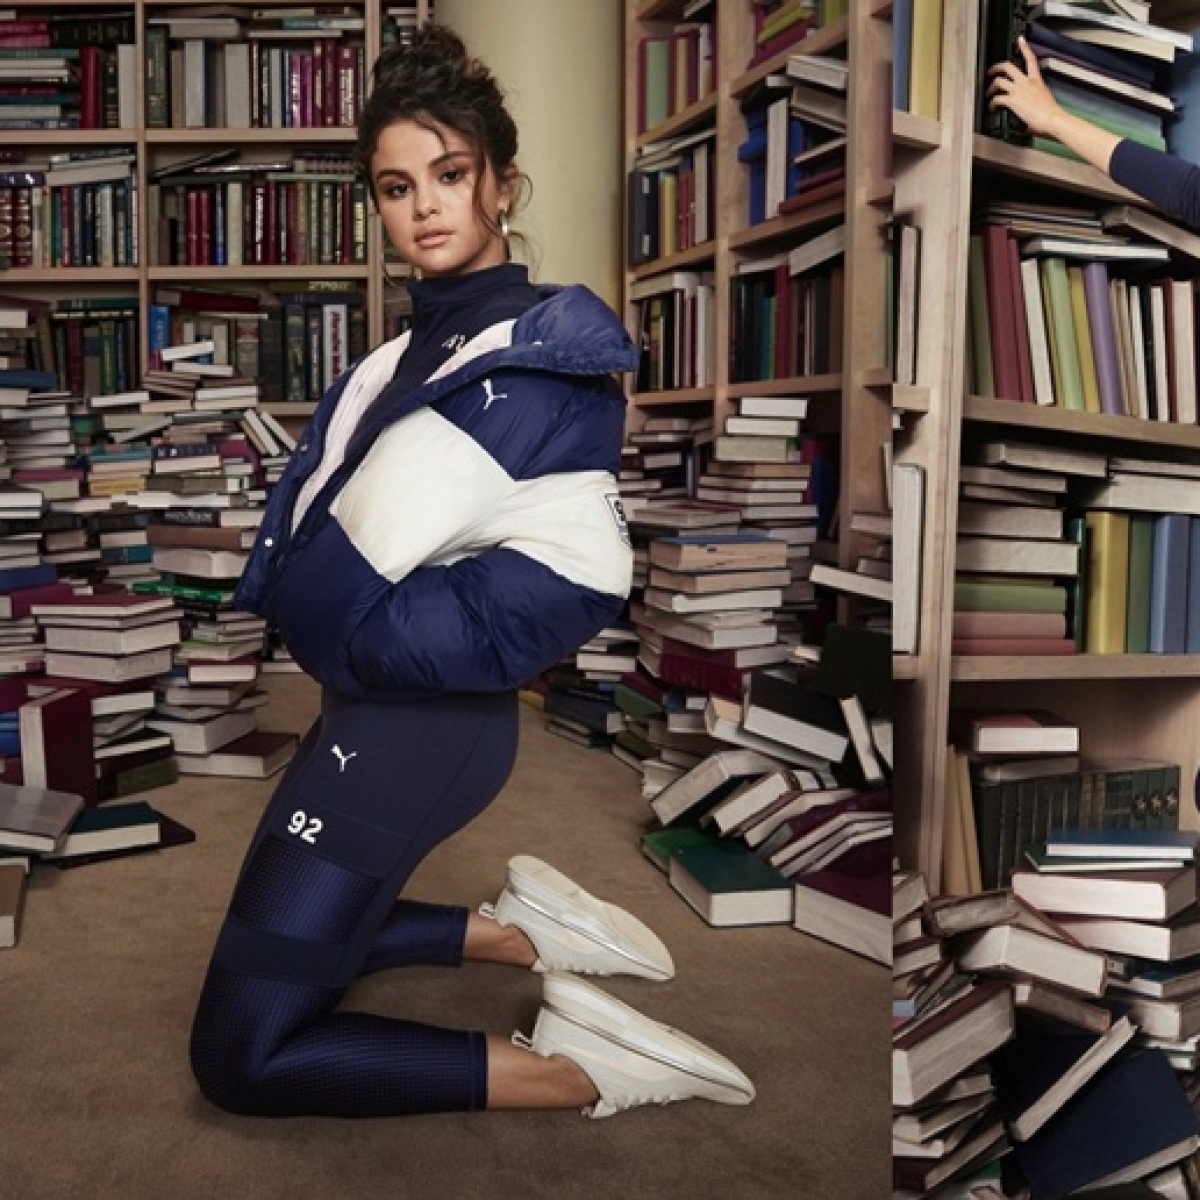 Saraswati Mata will slap you: Desi Twitter is mad at Selena Gomez for standing on books